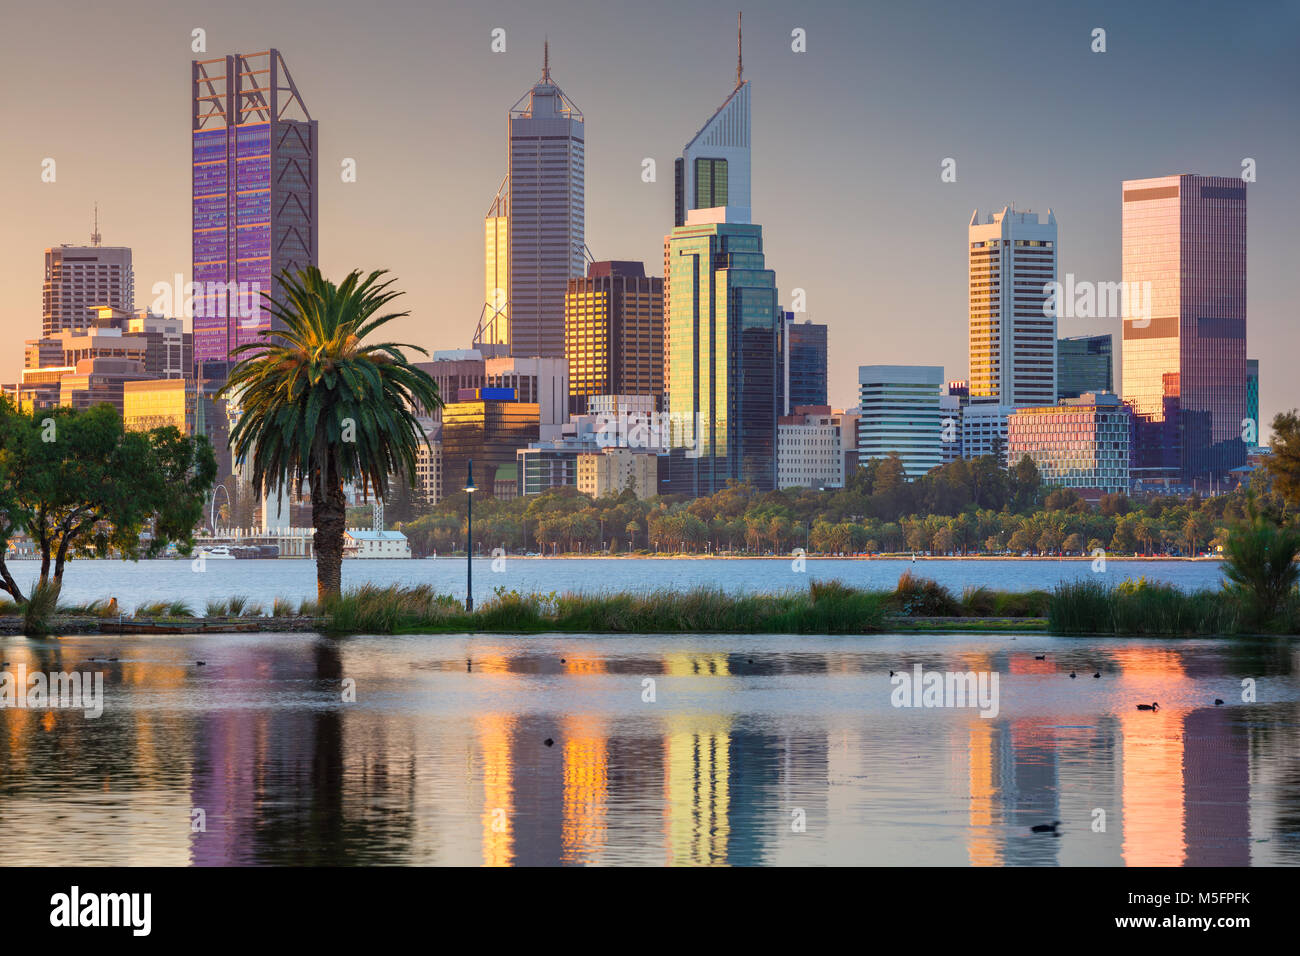 Perth. Cityscape image of Perth skyline, Australia during sunset. - Stock Image